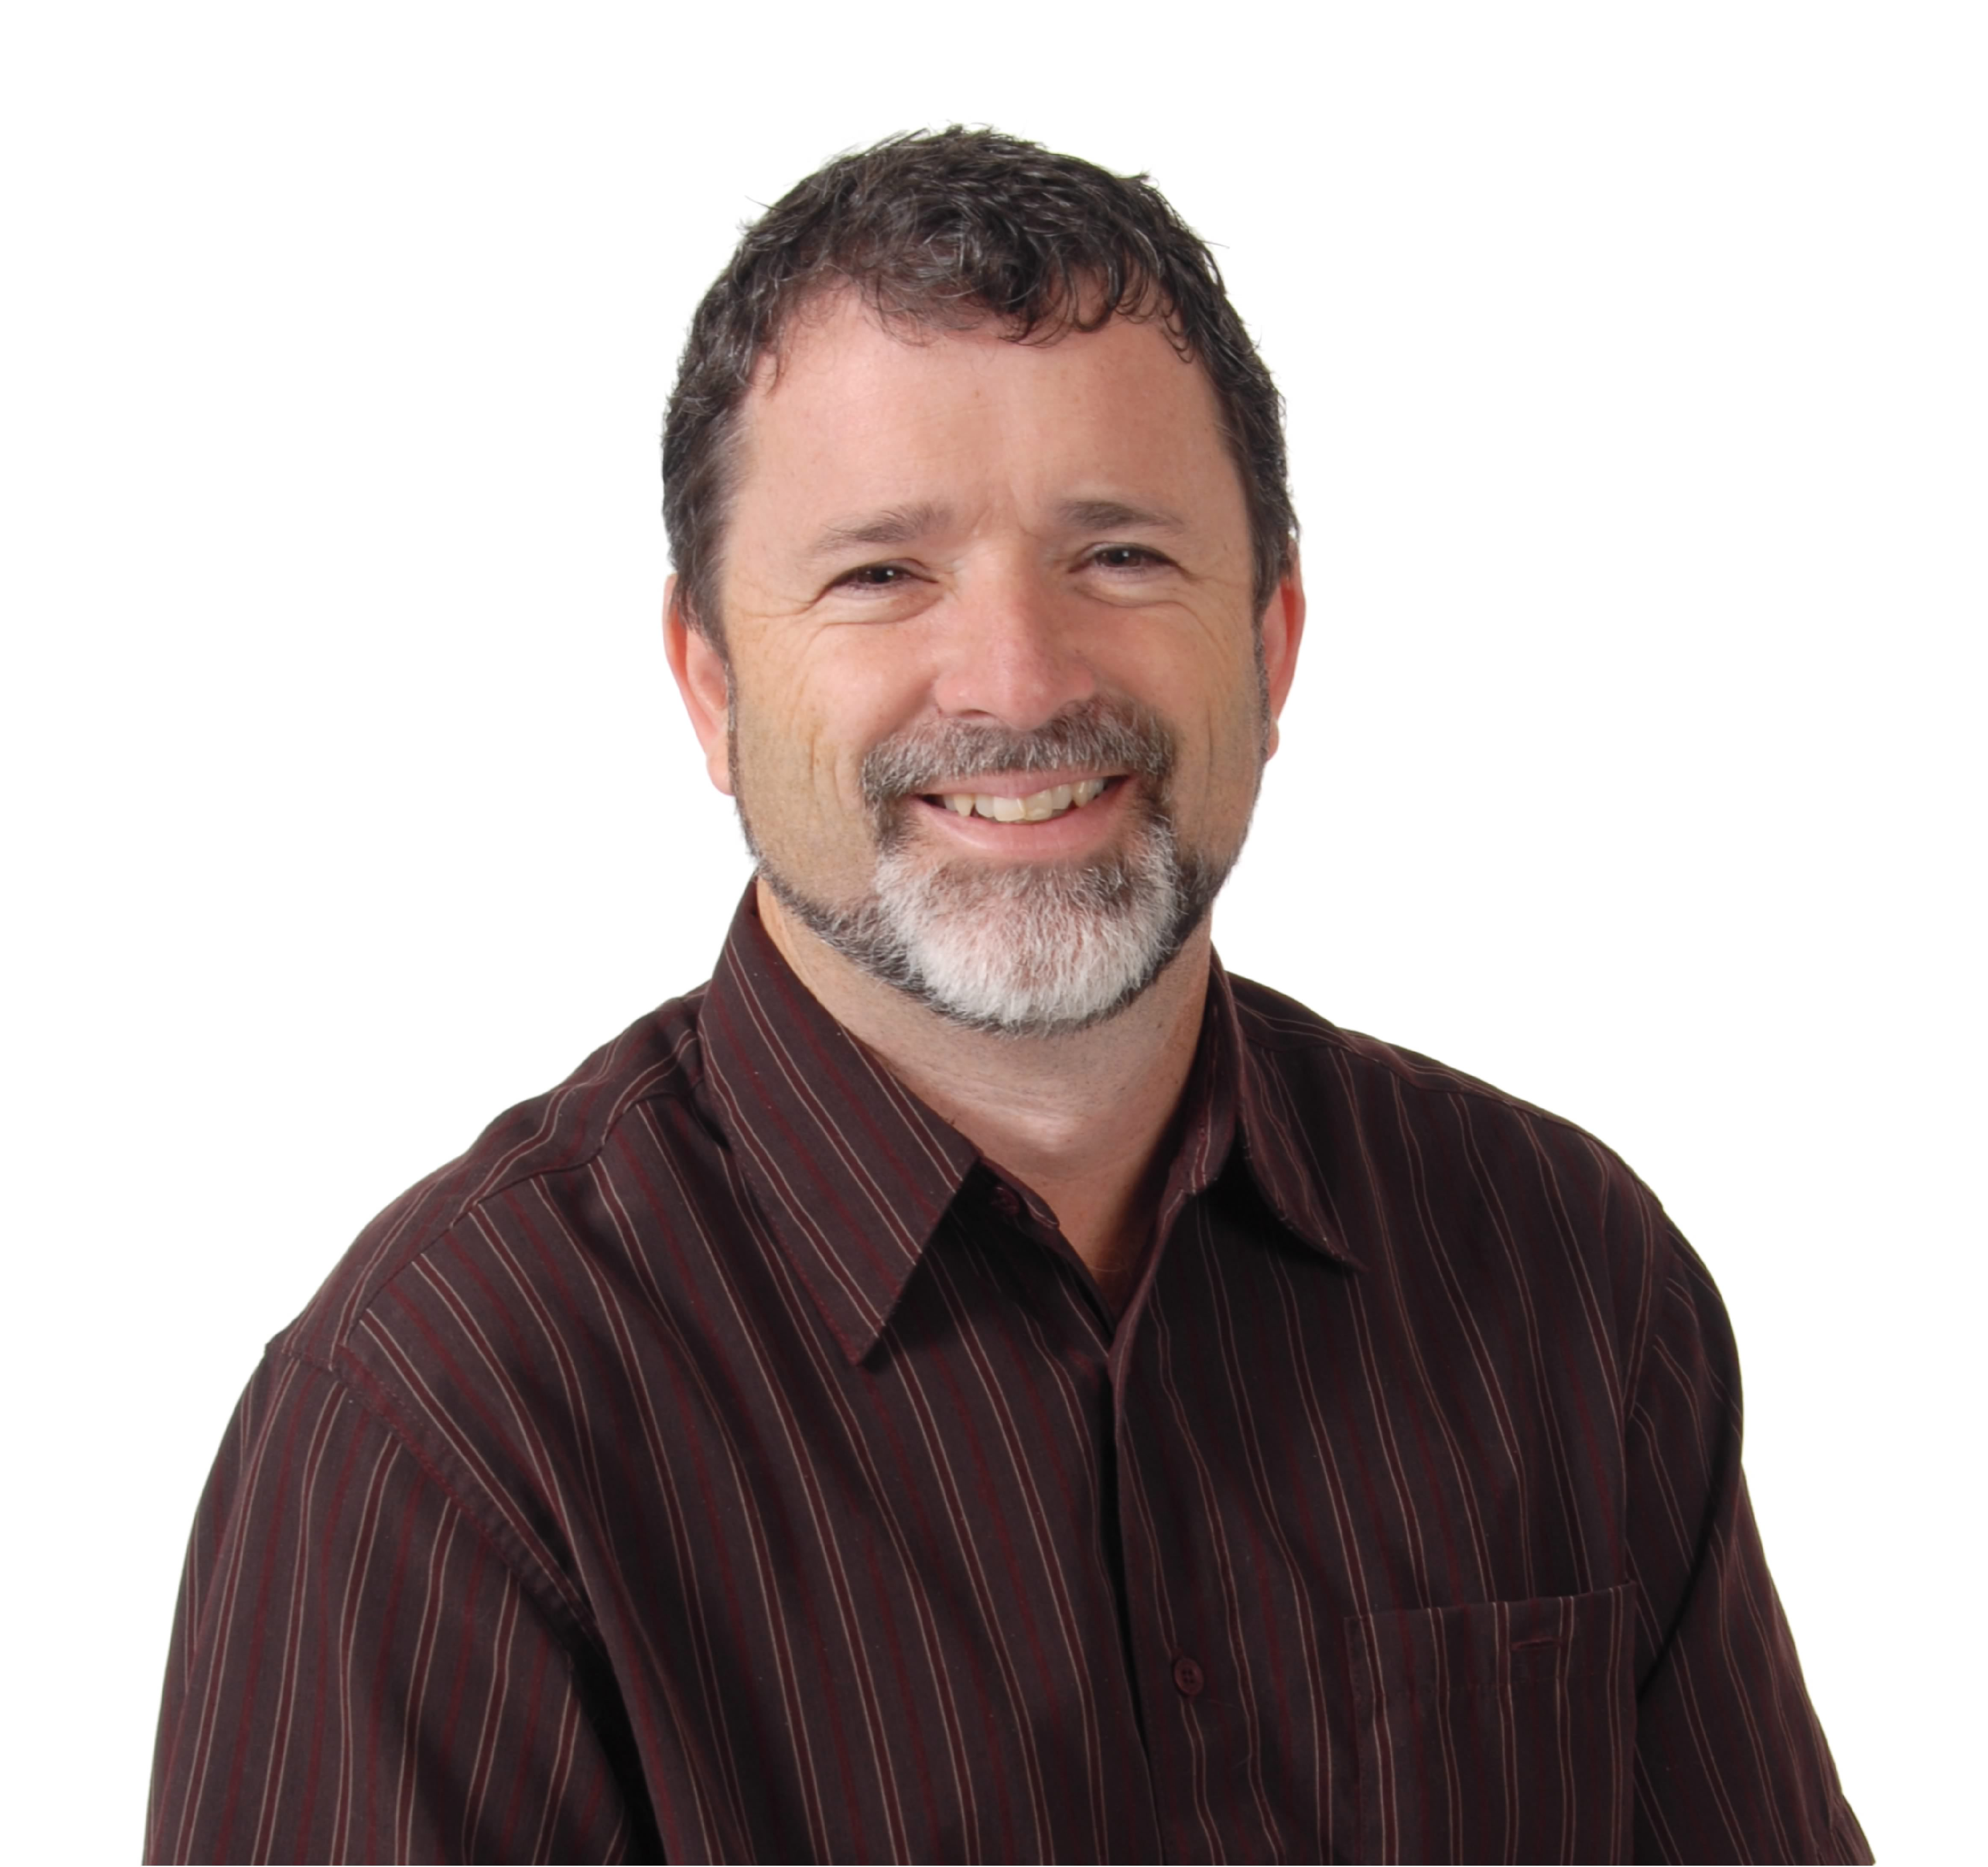 Dr. Michael Dennin